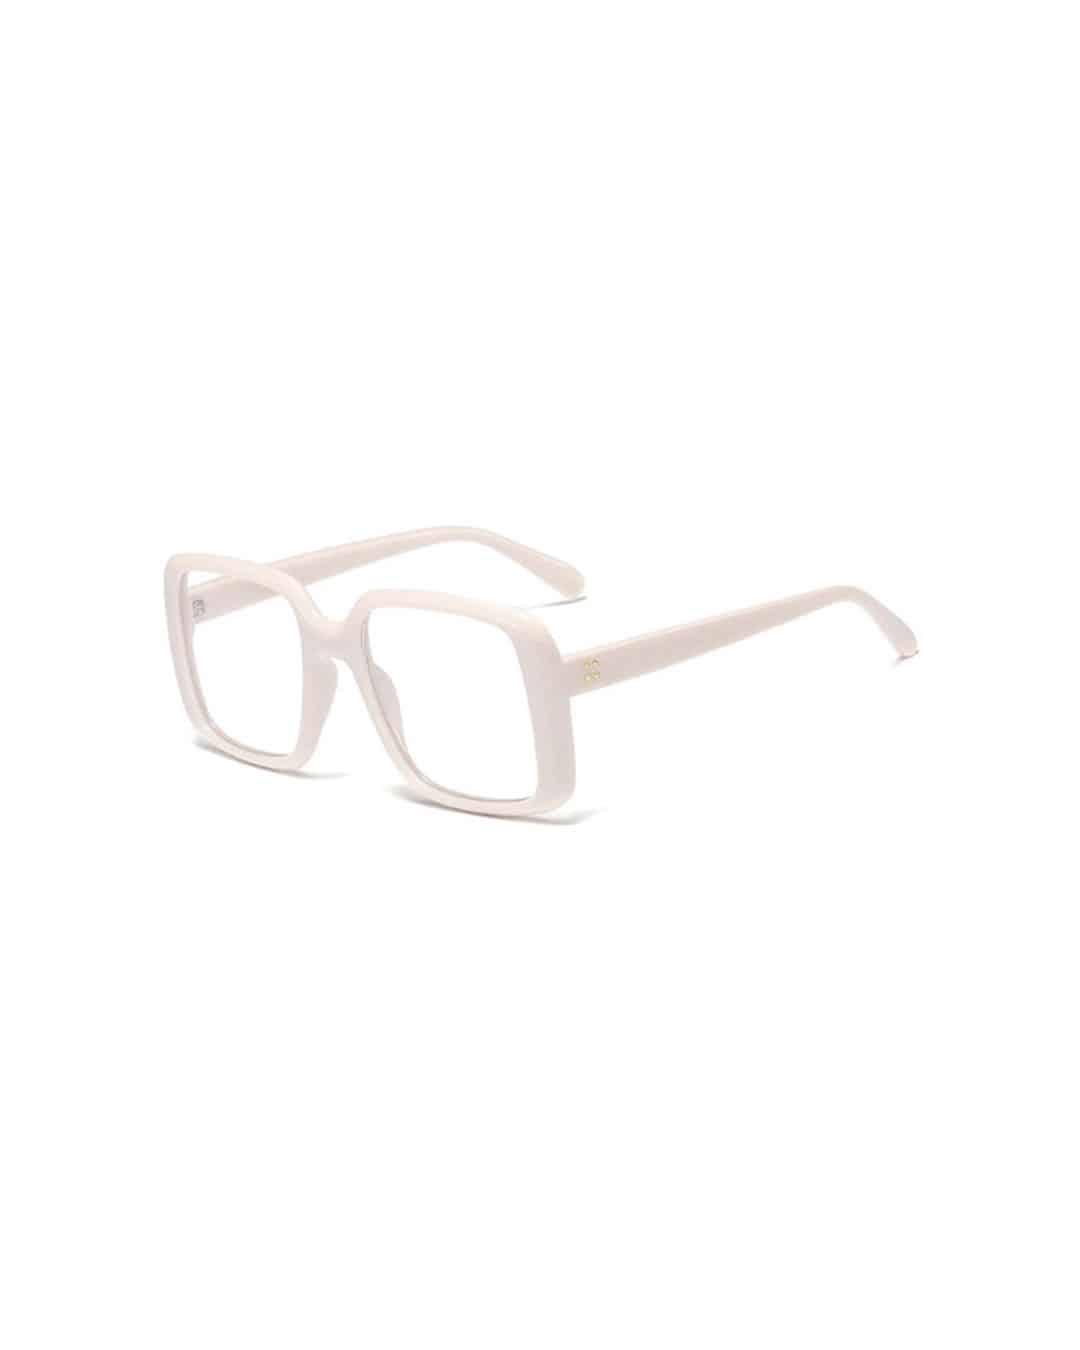 Chelsea-Opticals-White-2